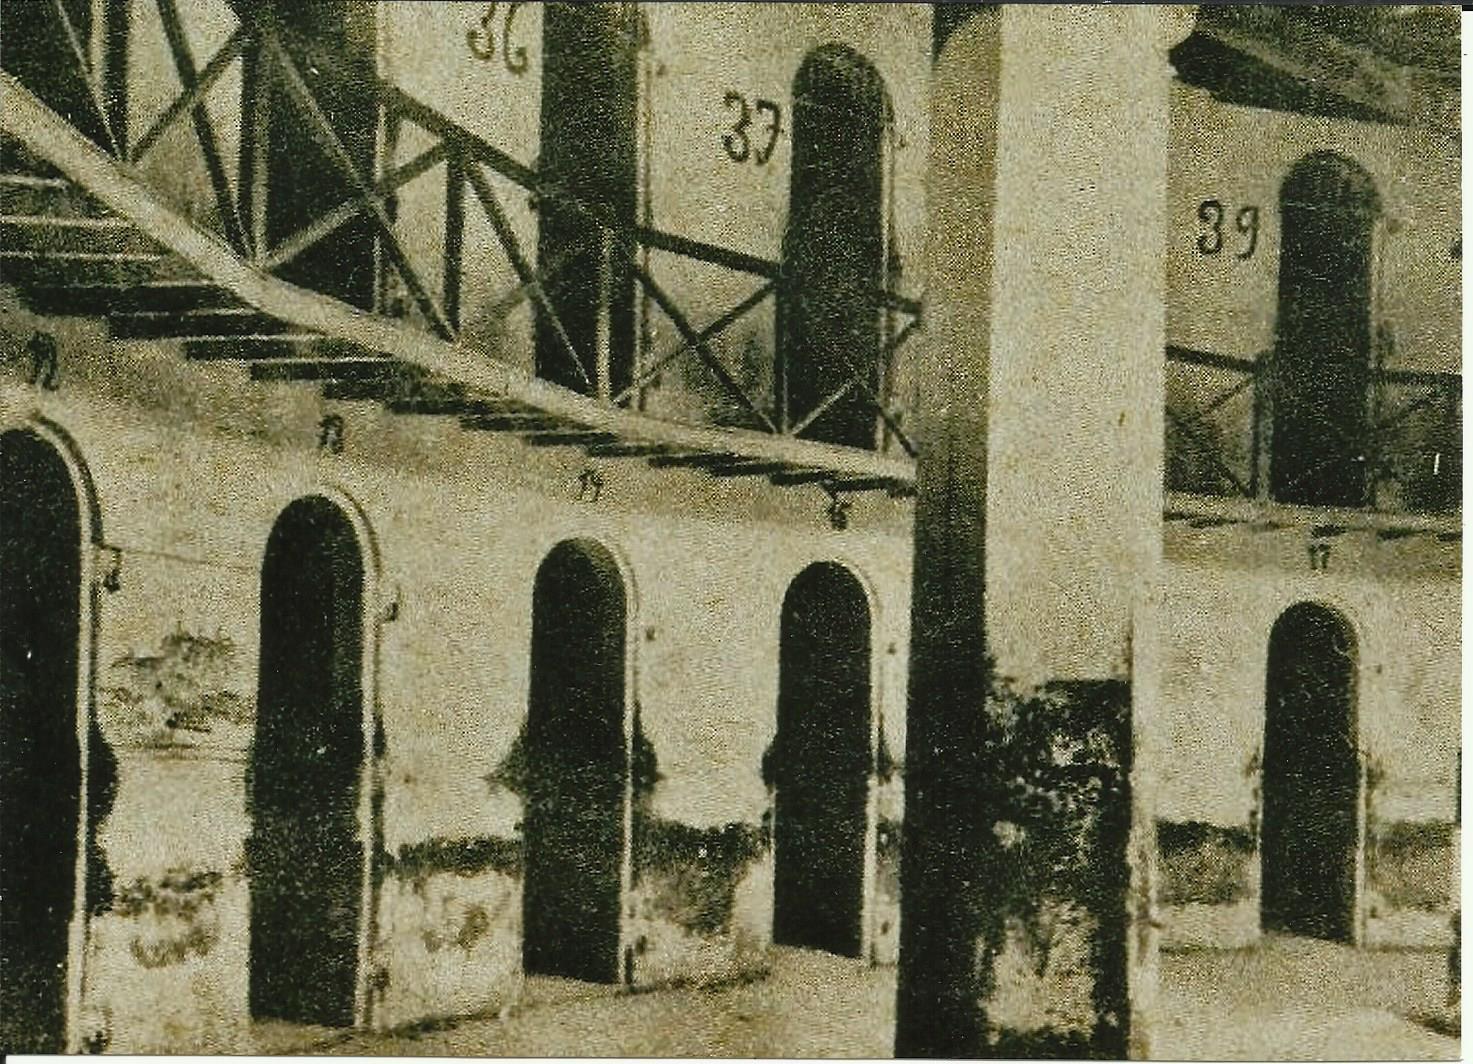 RAFAEL ARÉVALO GONZÁLEZ: CONSTANCIA, SACRIFICIO Y ESPERANZA (3)